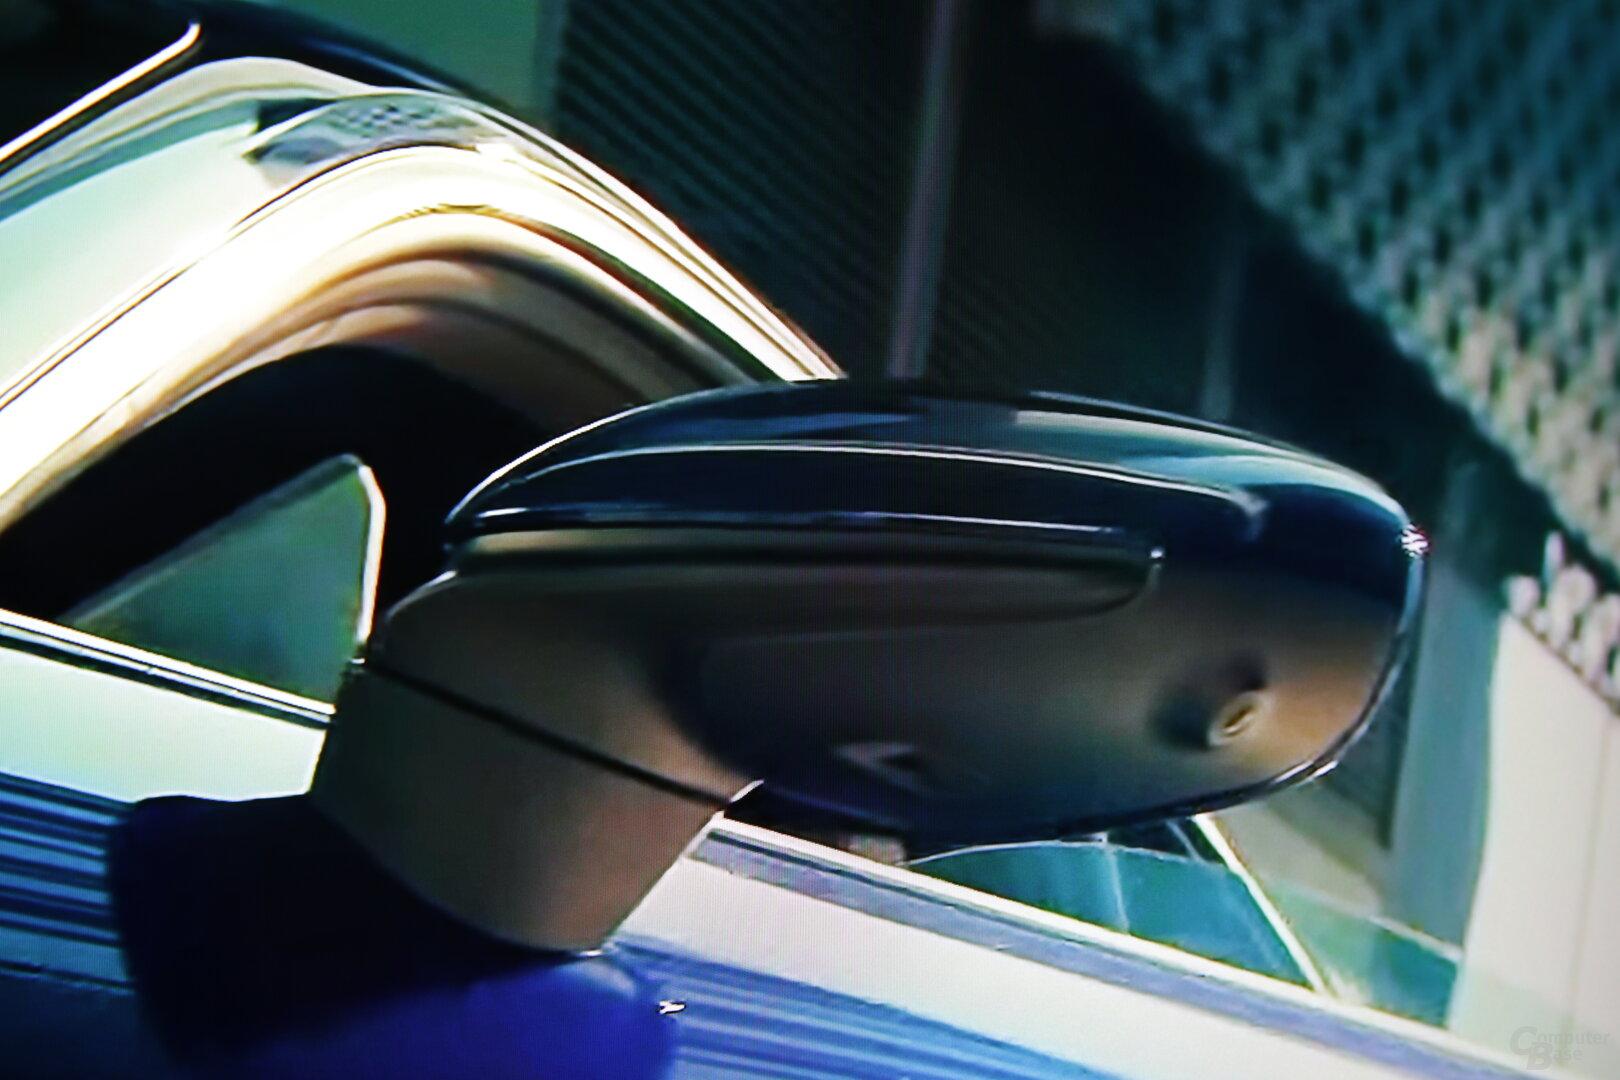 Szene aus Bad Boys for Life Trailer: KI-Upscaling